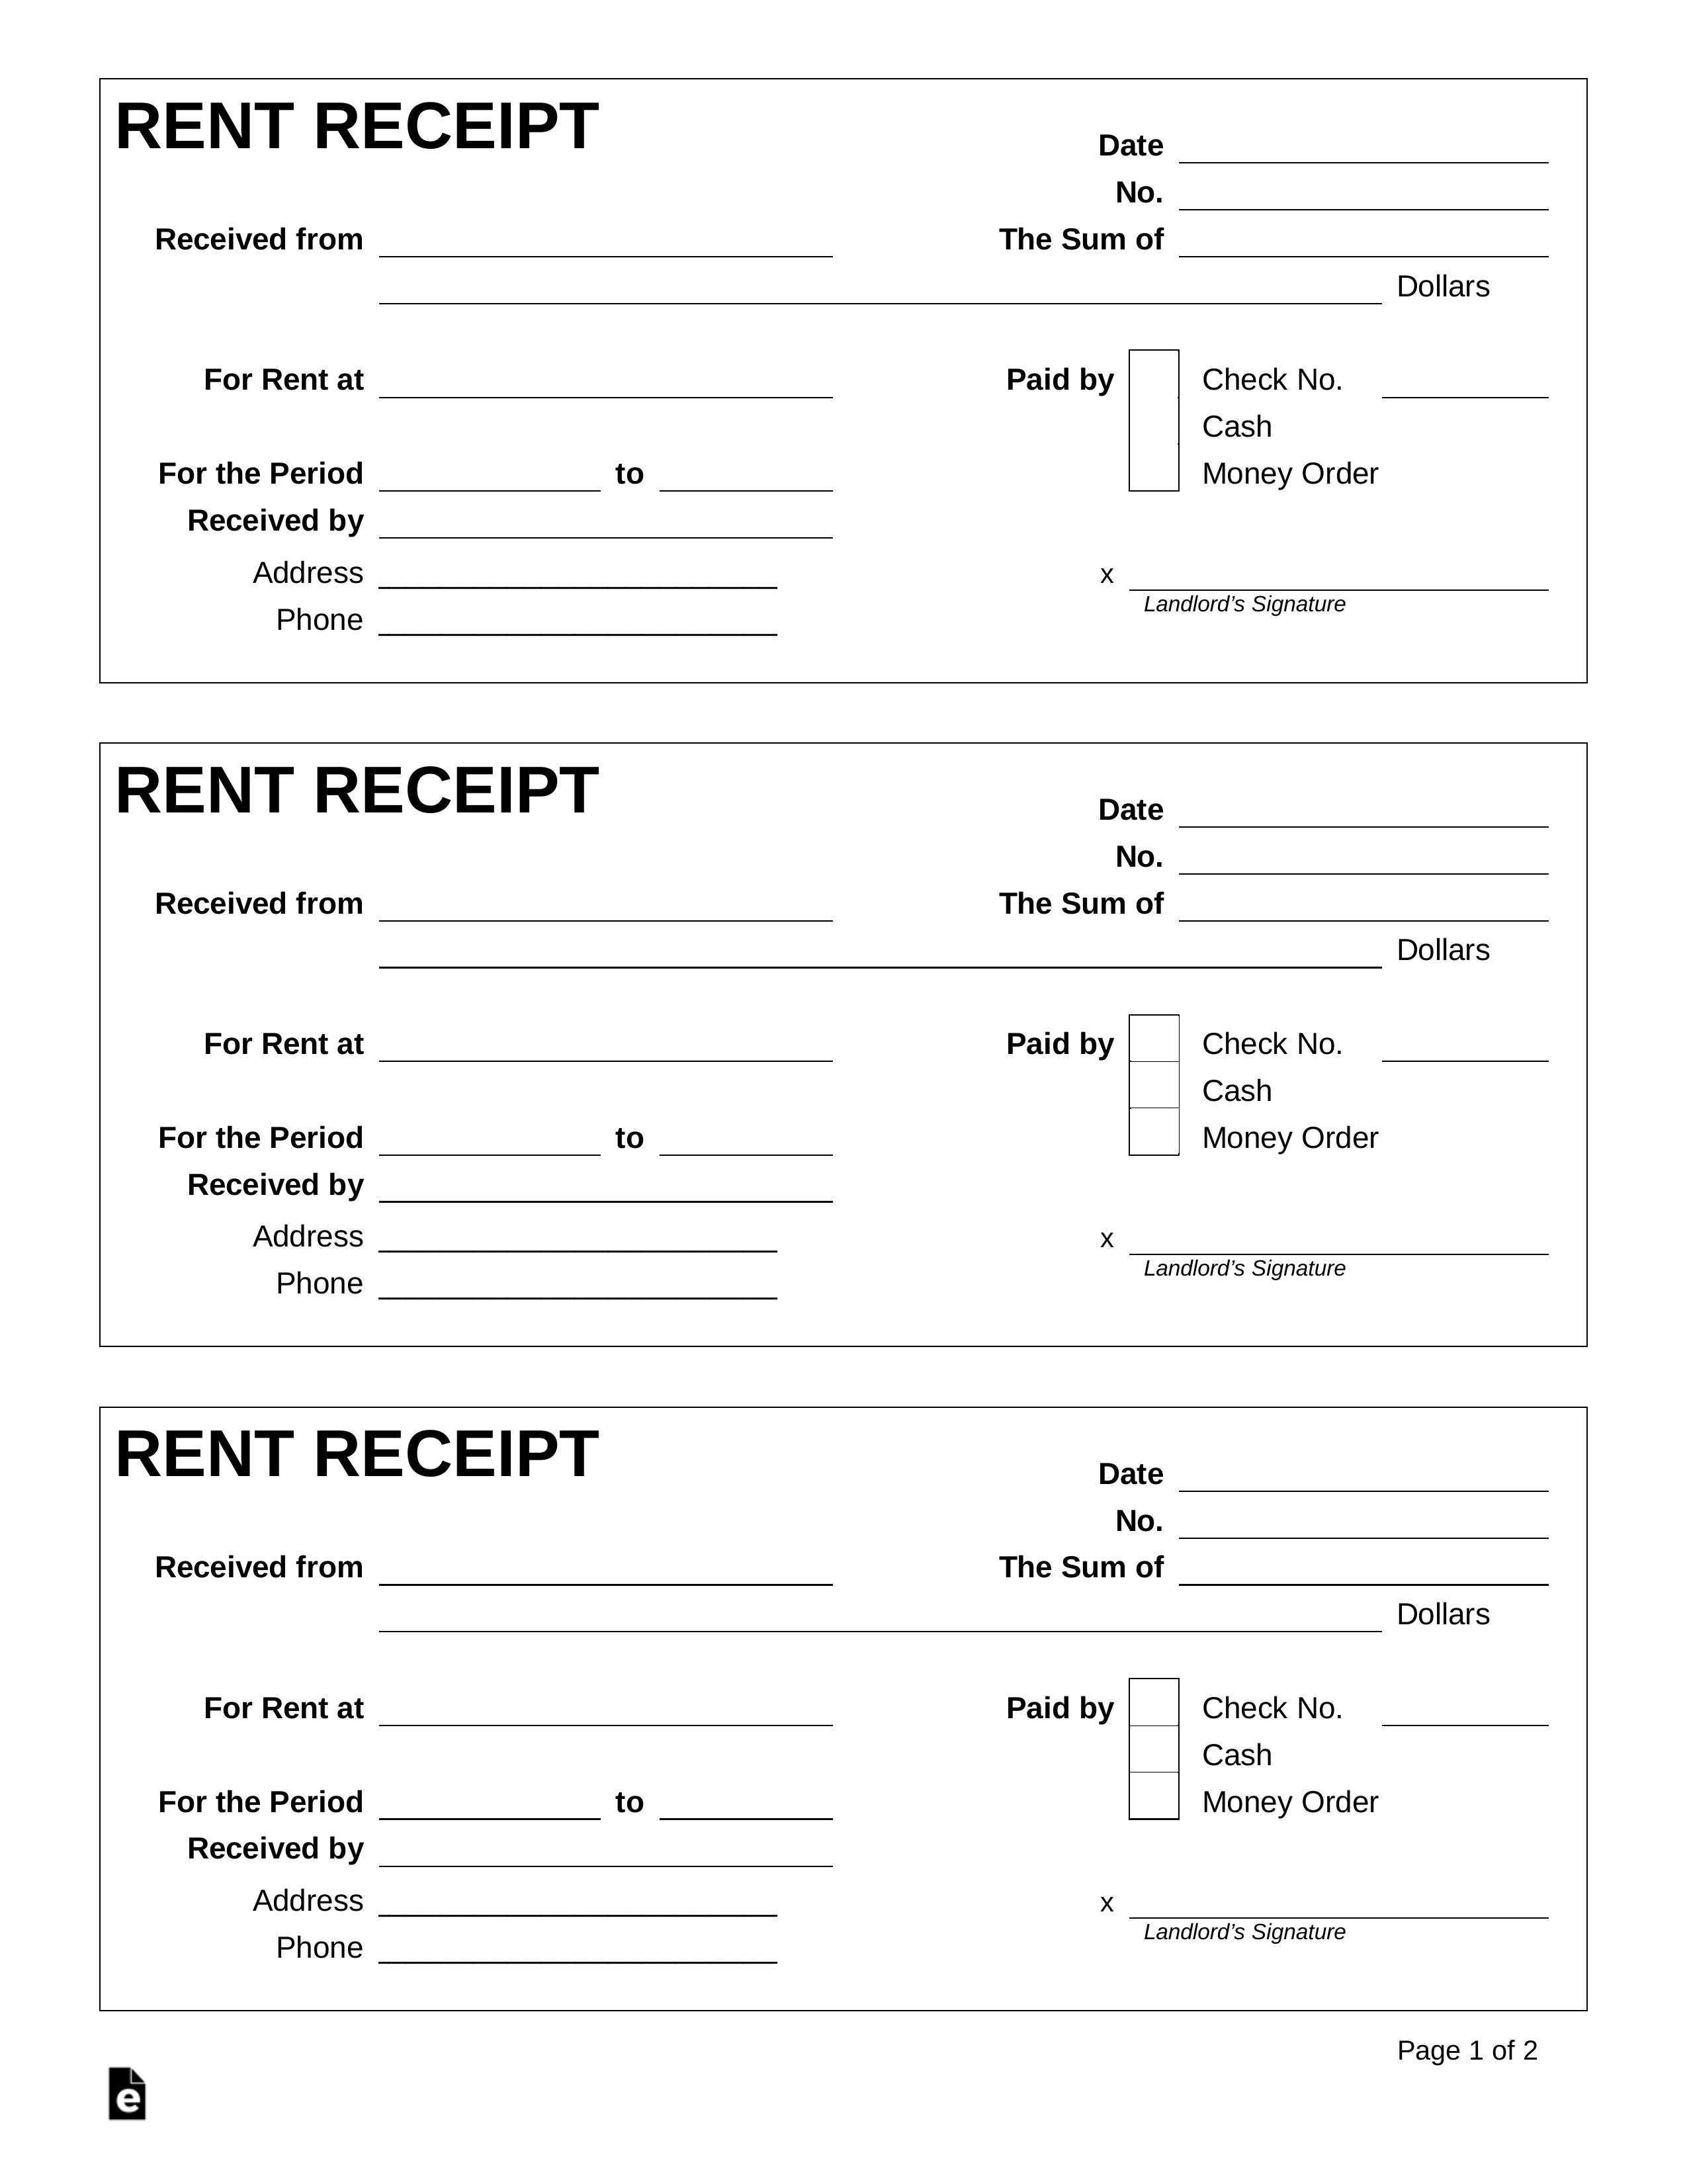 Free Rent Receipt Template Pdf